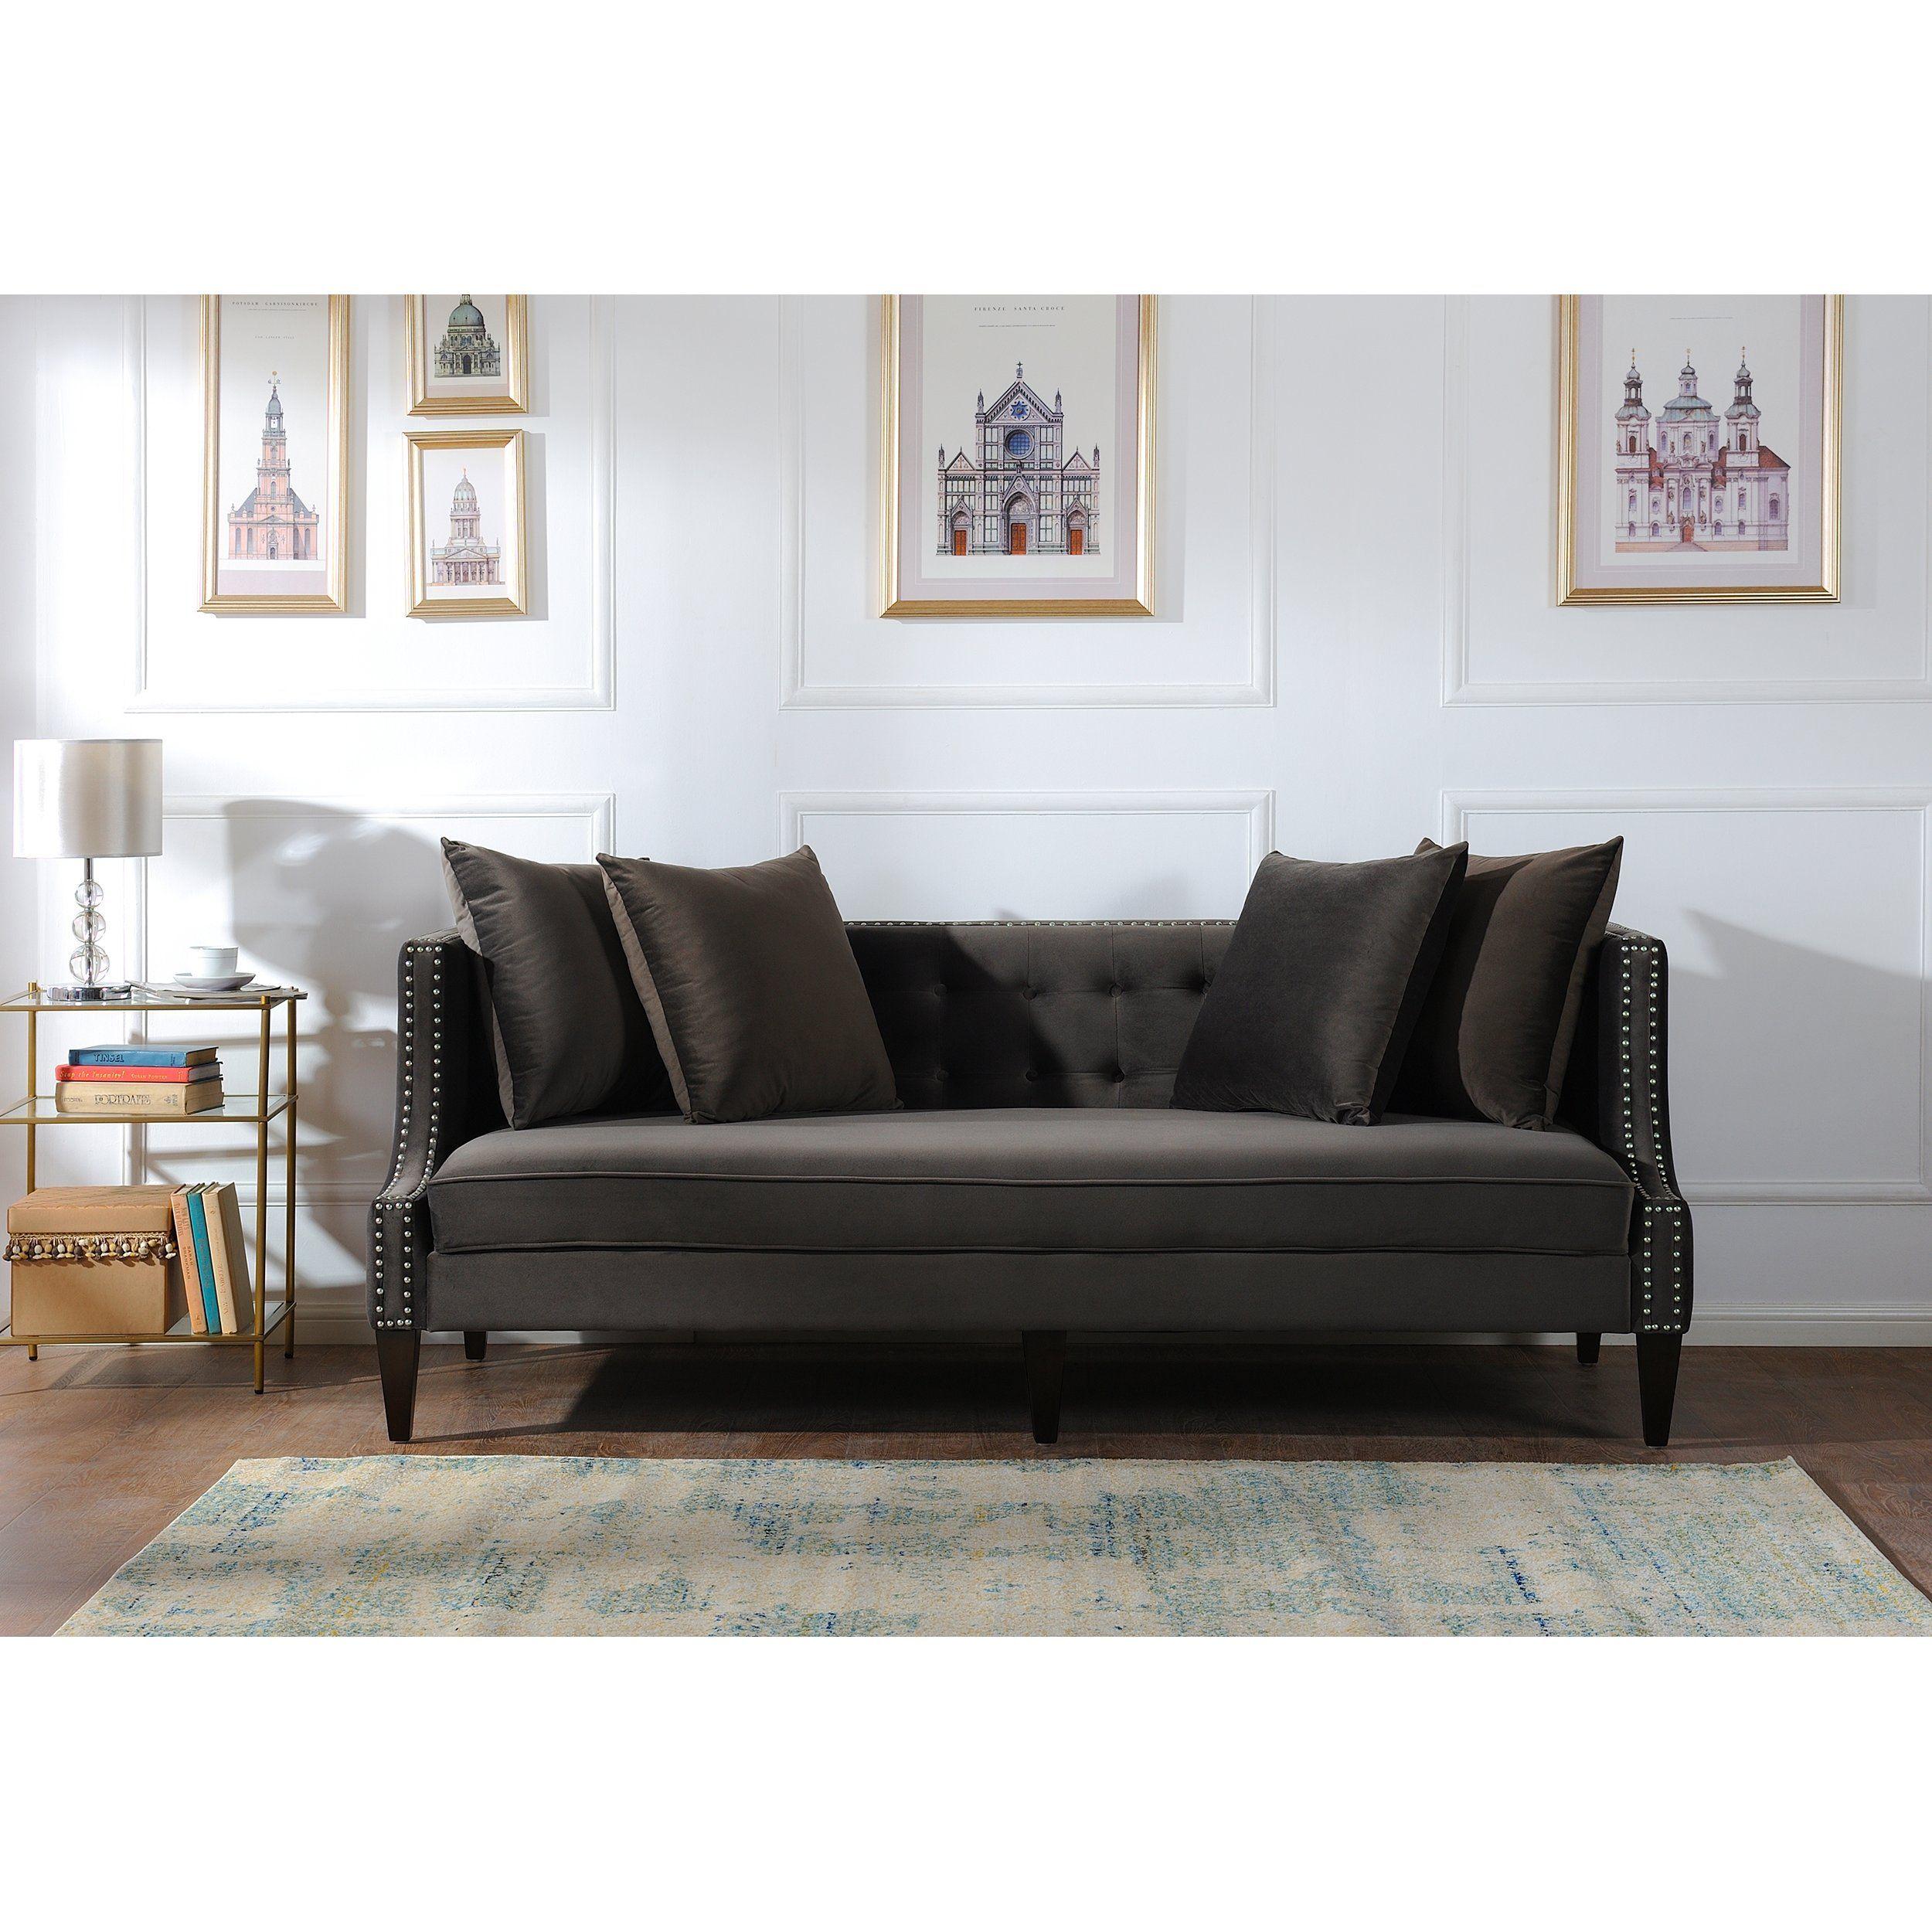 sofasofa reviews finn juhl poeten sofa pris mercer41 lyda caroline and wayfair ca couch